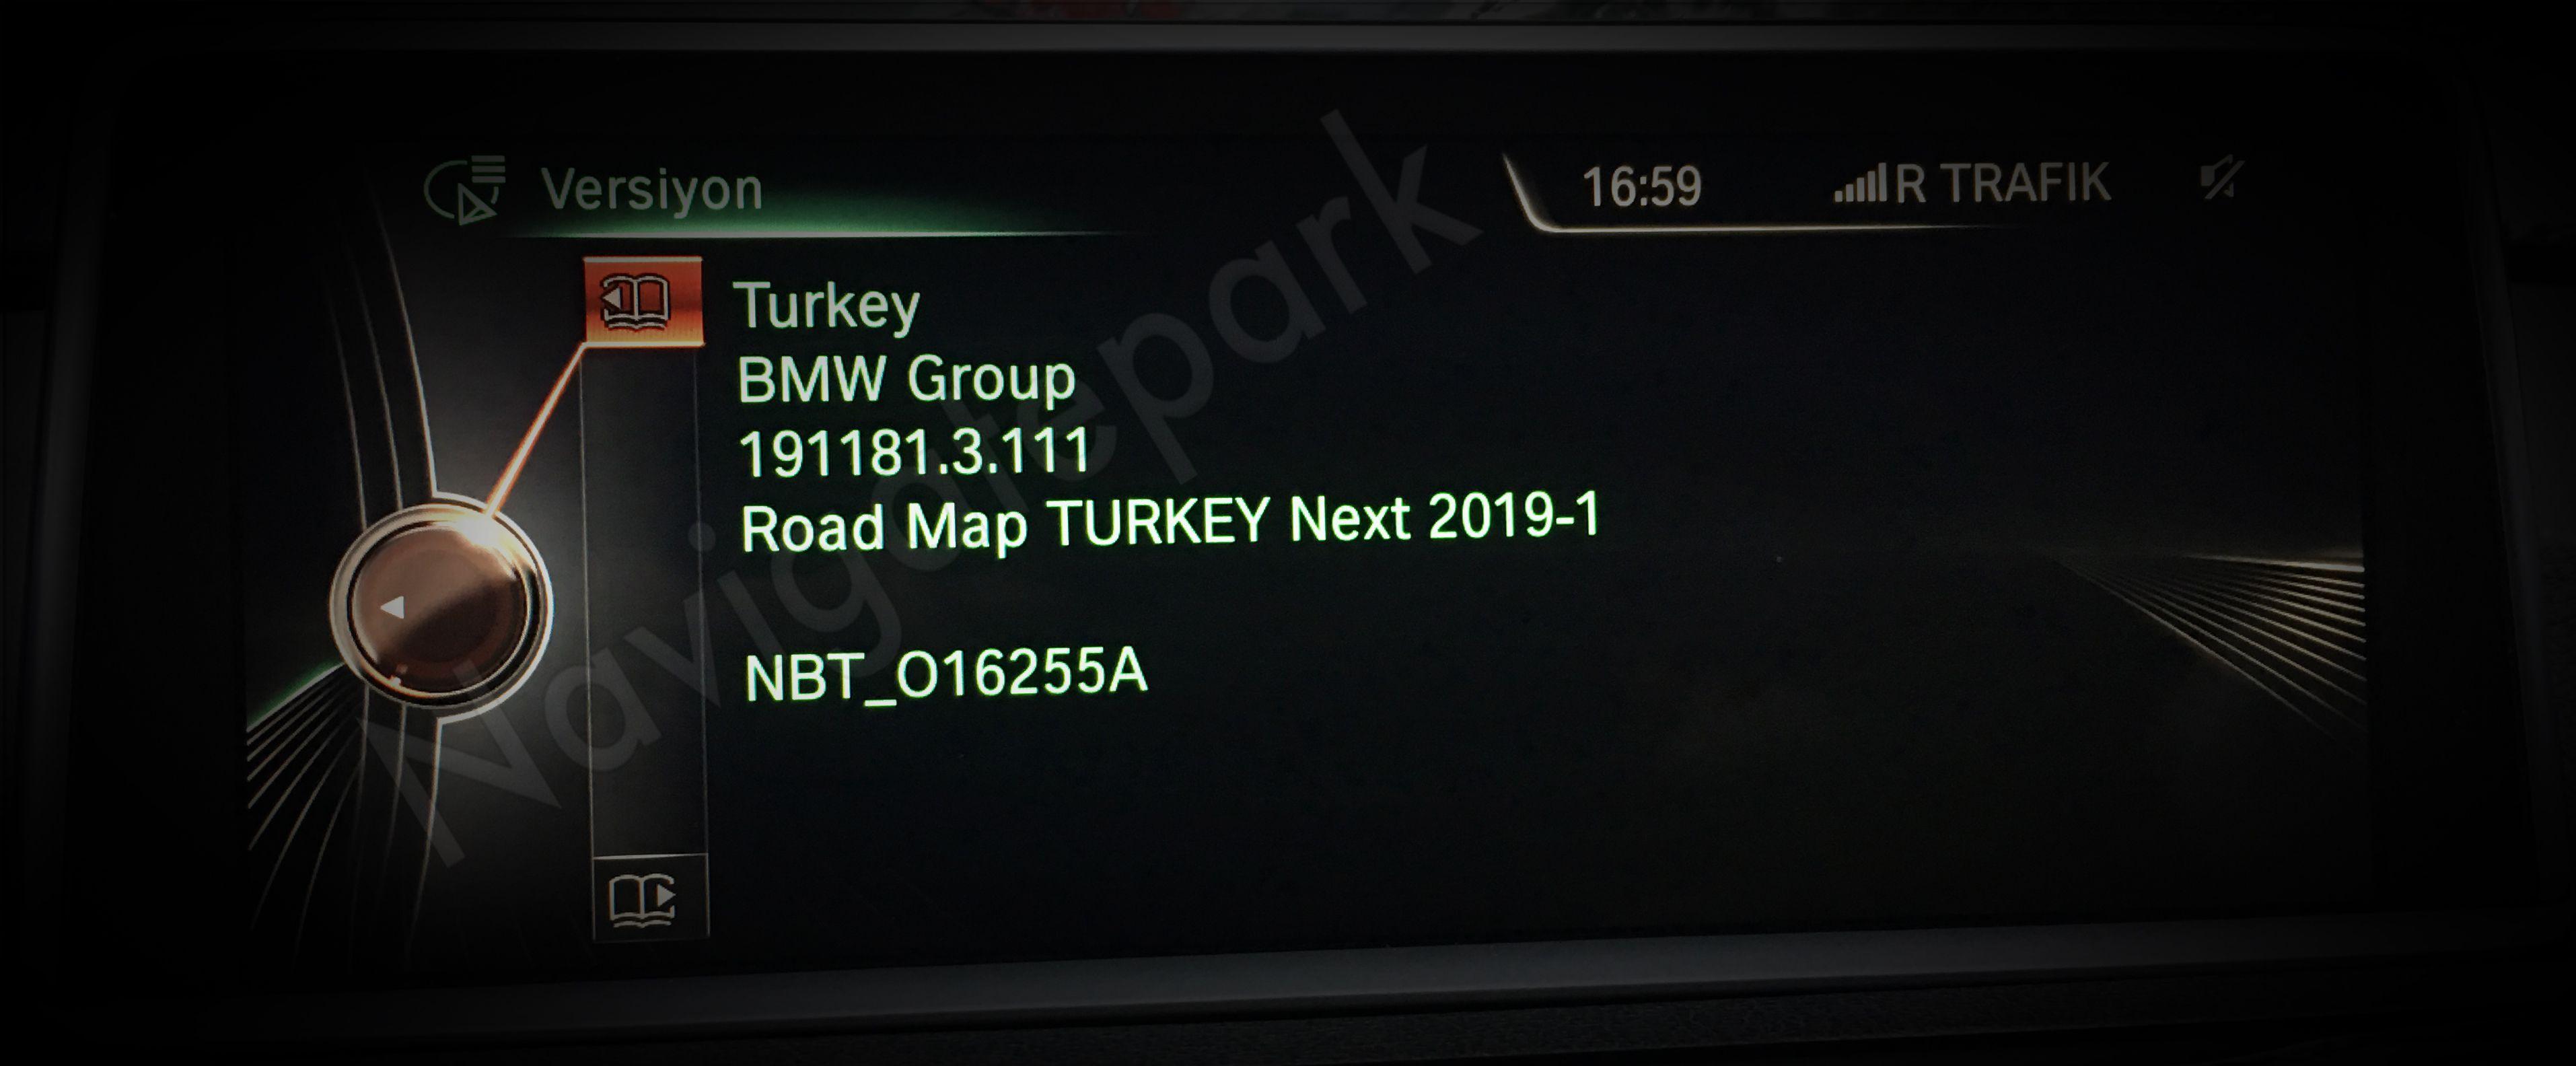 Bmw Road Map Turkey Next 2019 1 Geldi Navigatepark Com Dan